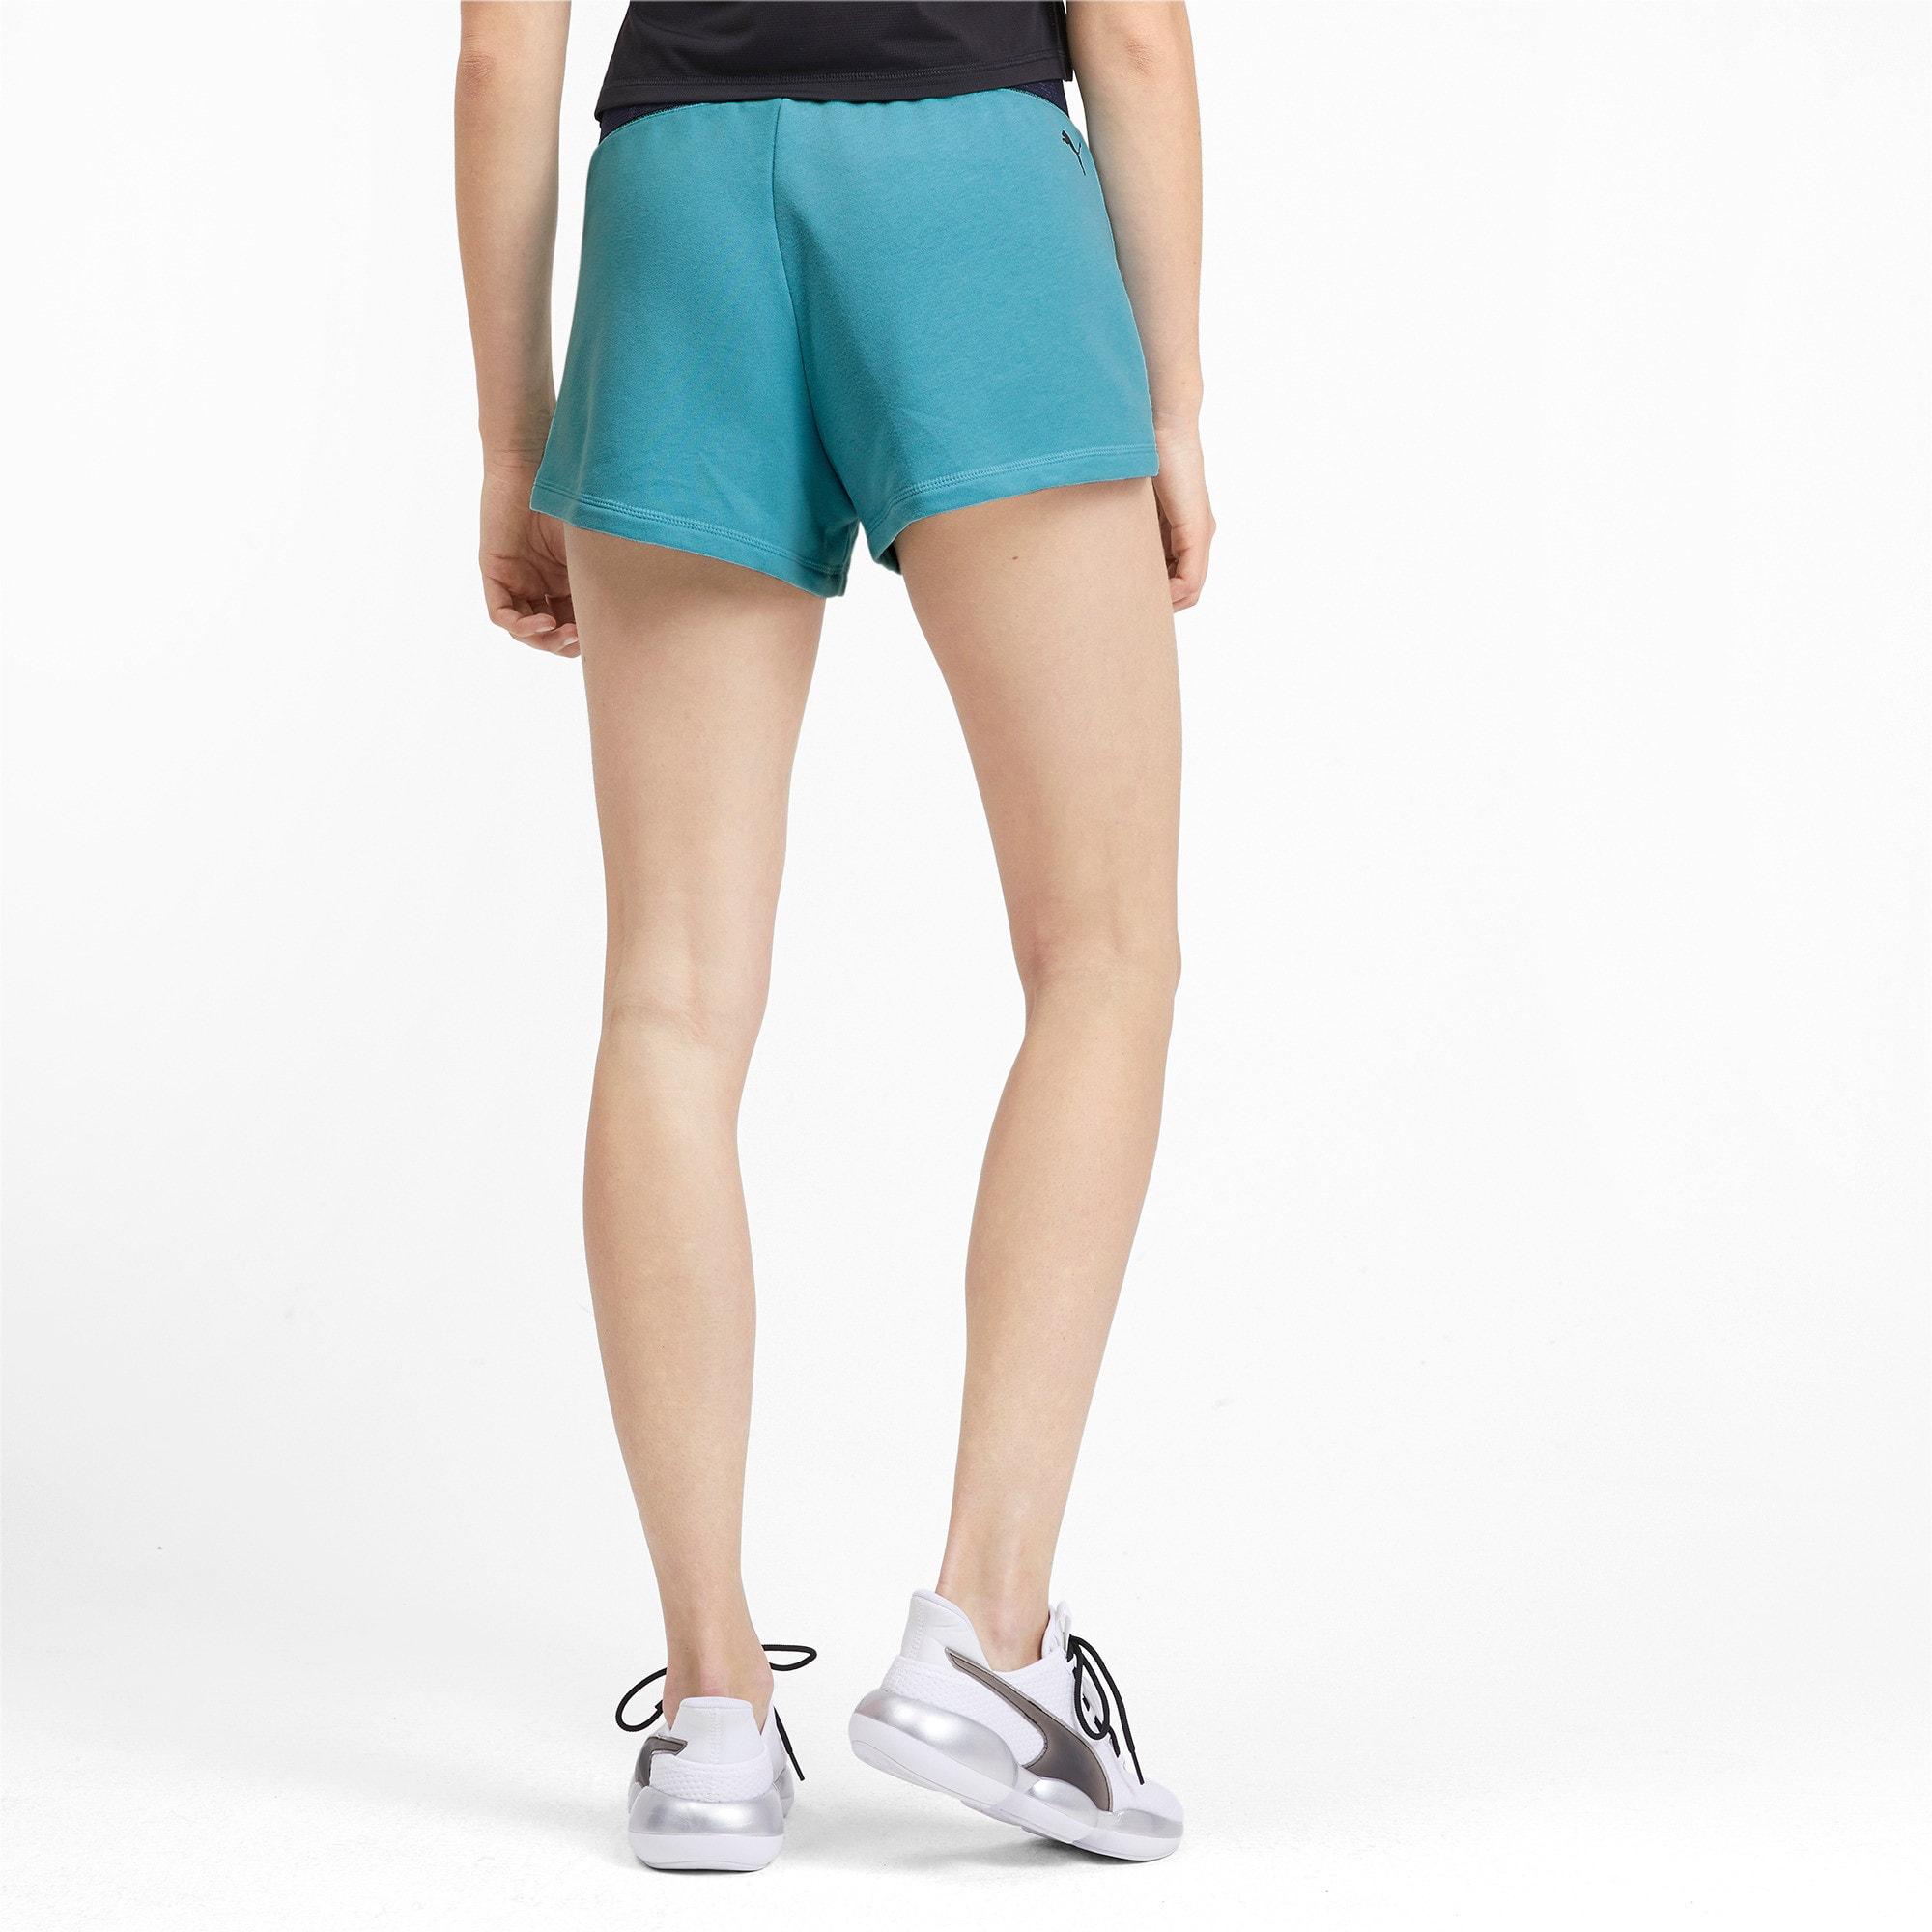 Miniatura 3 de Shorts con logo para mujer, Milky Blue Heather, mediano